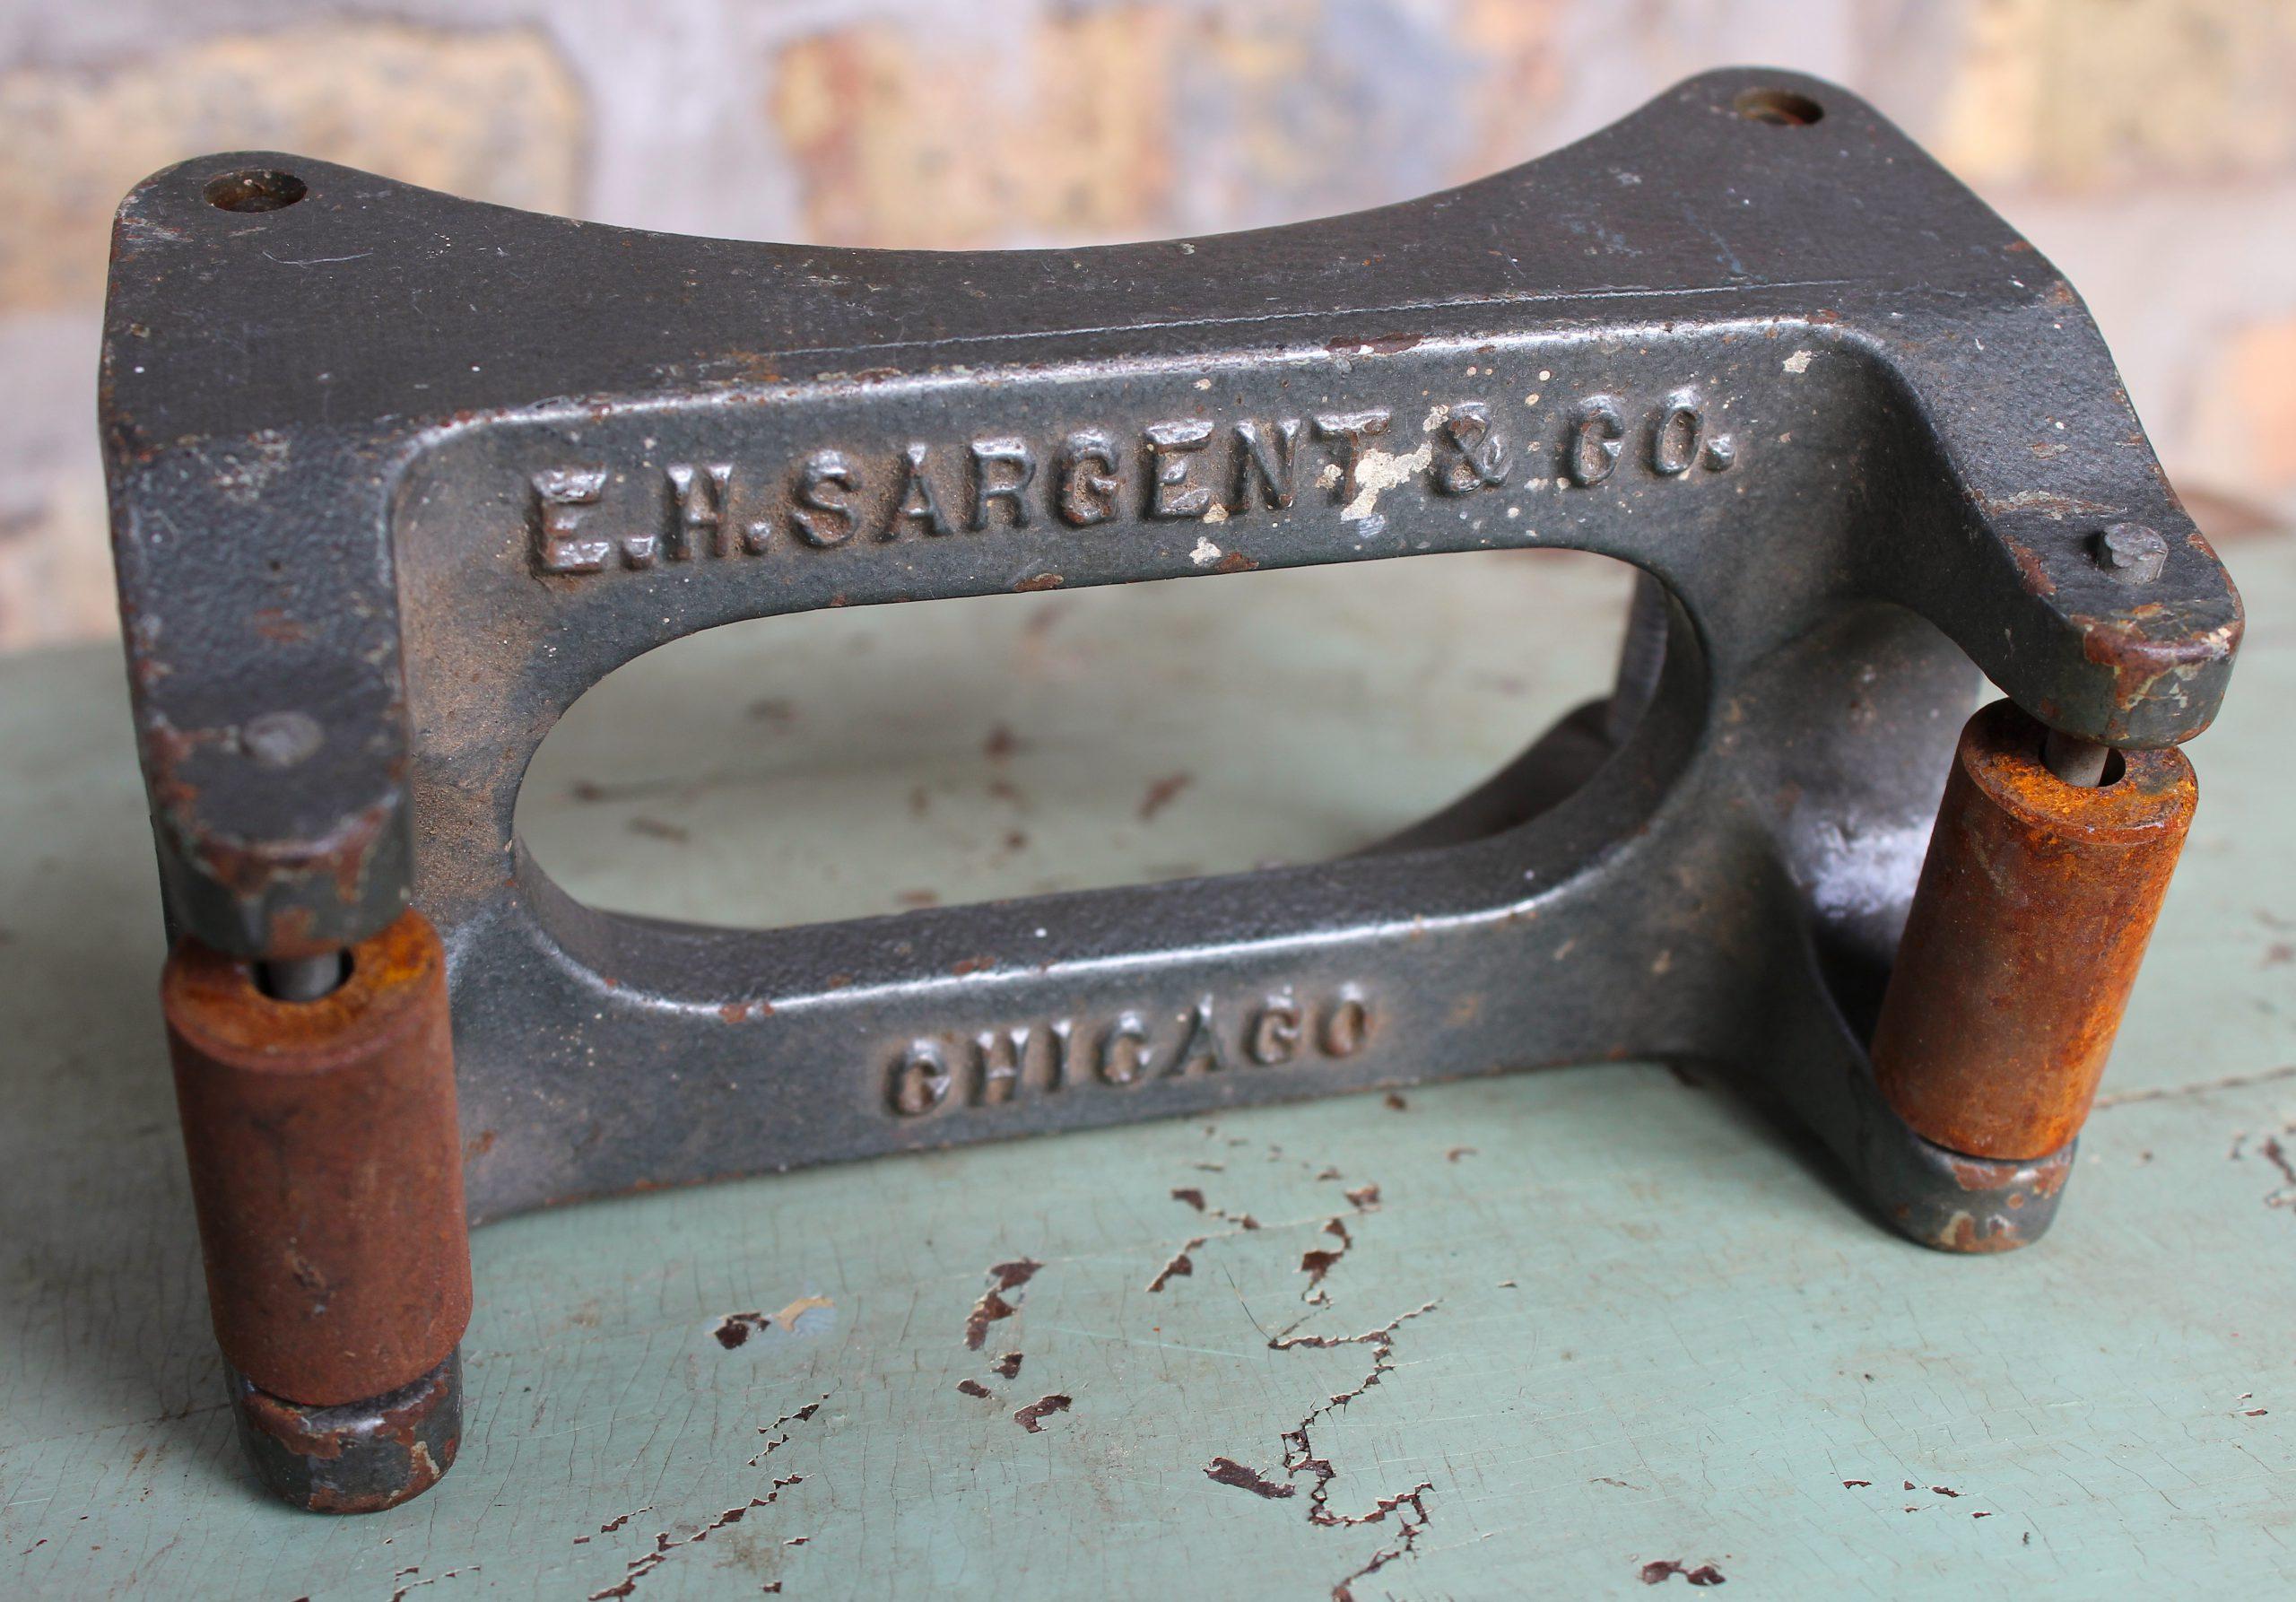 E. H. Sargent History